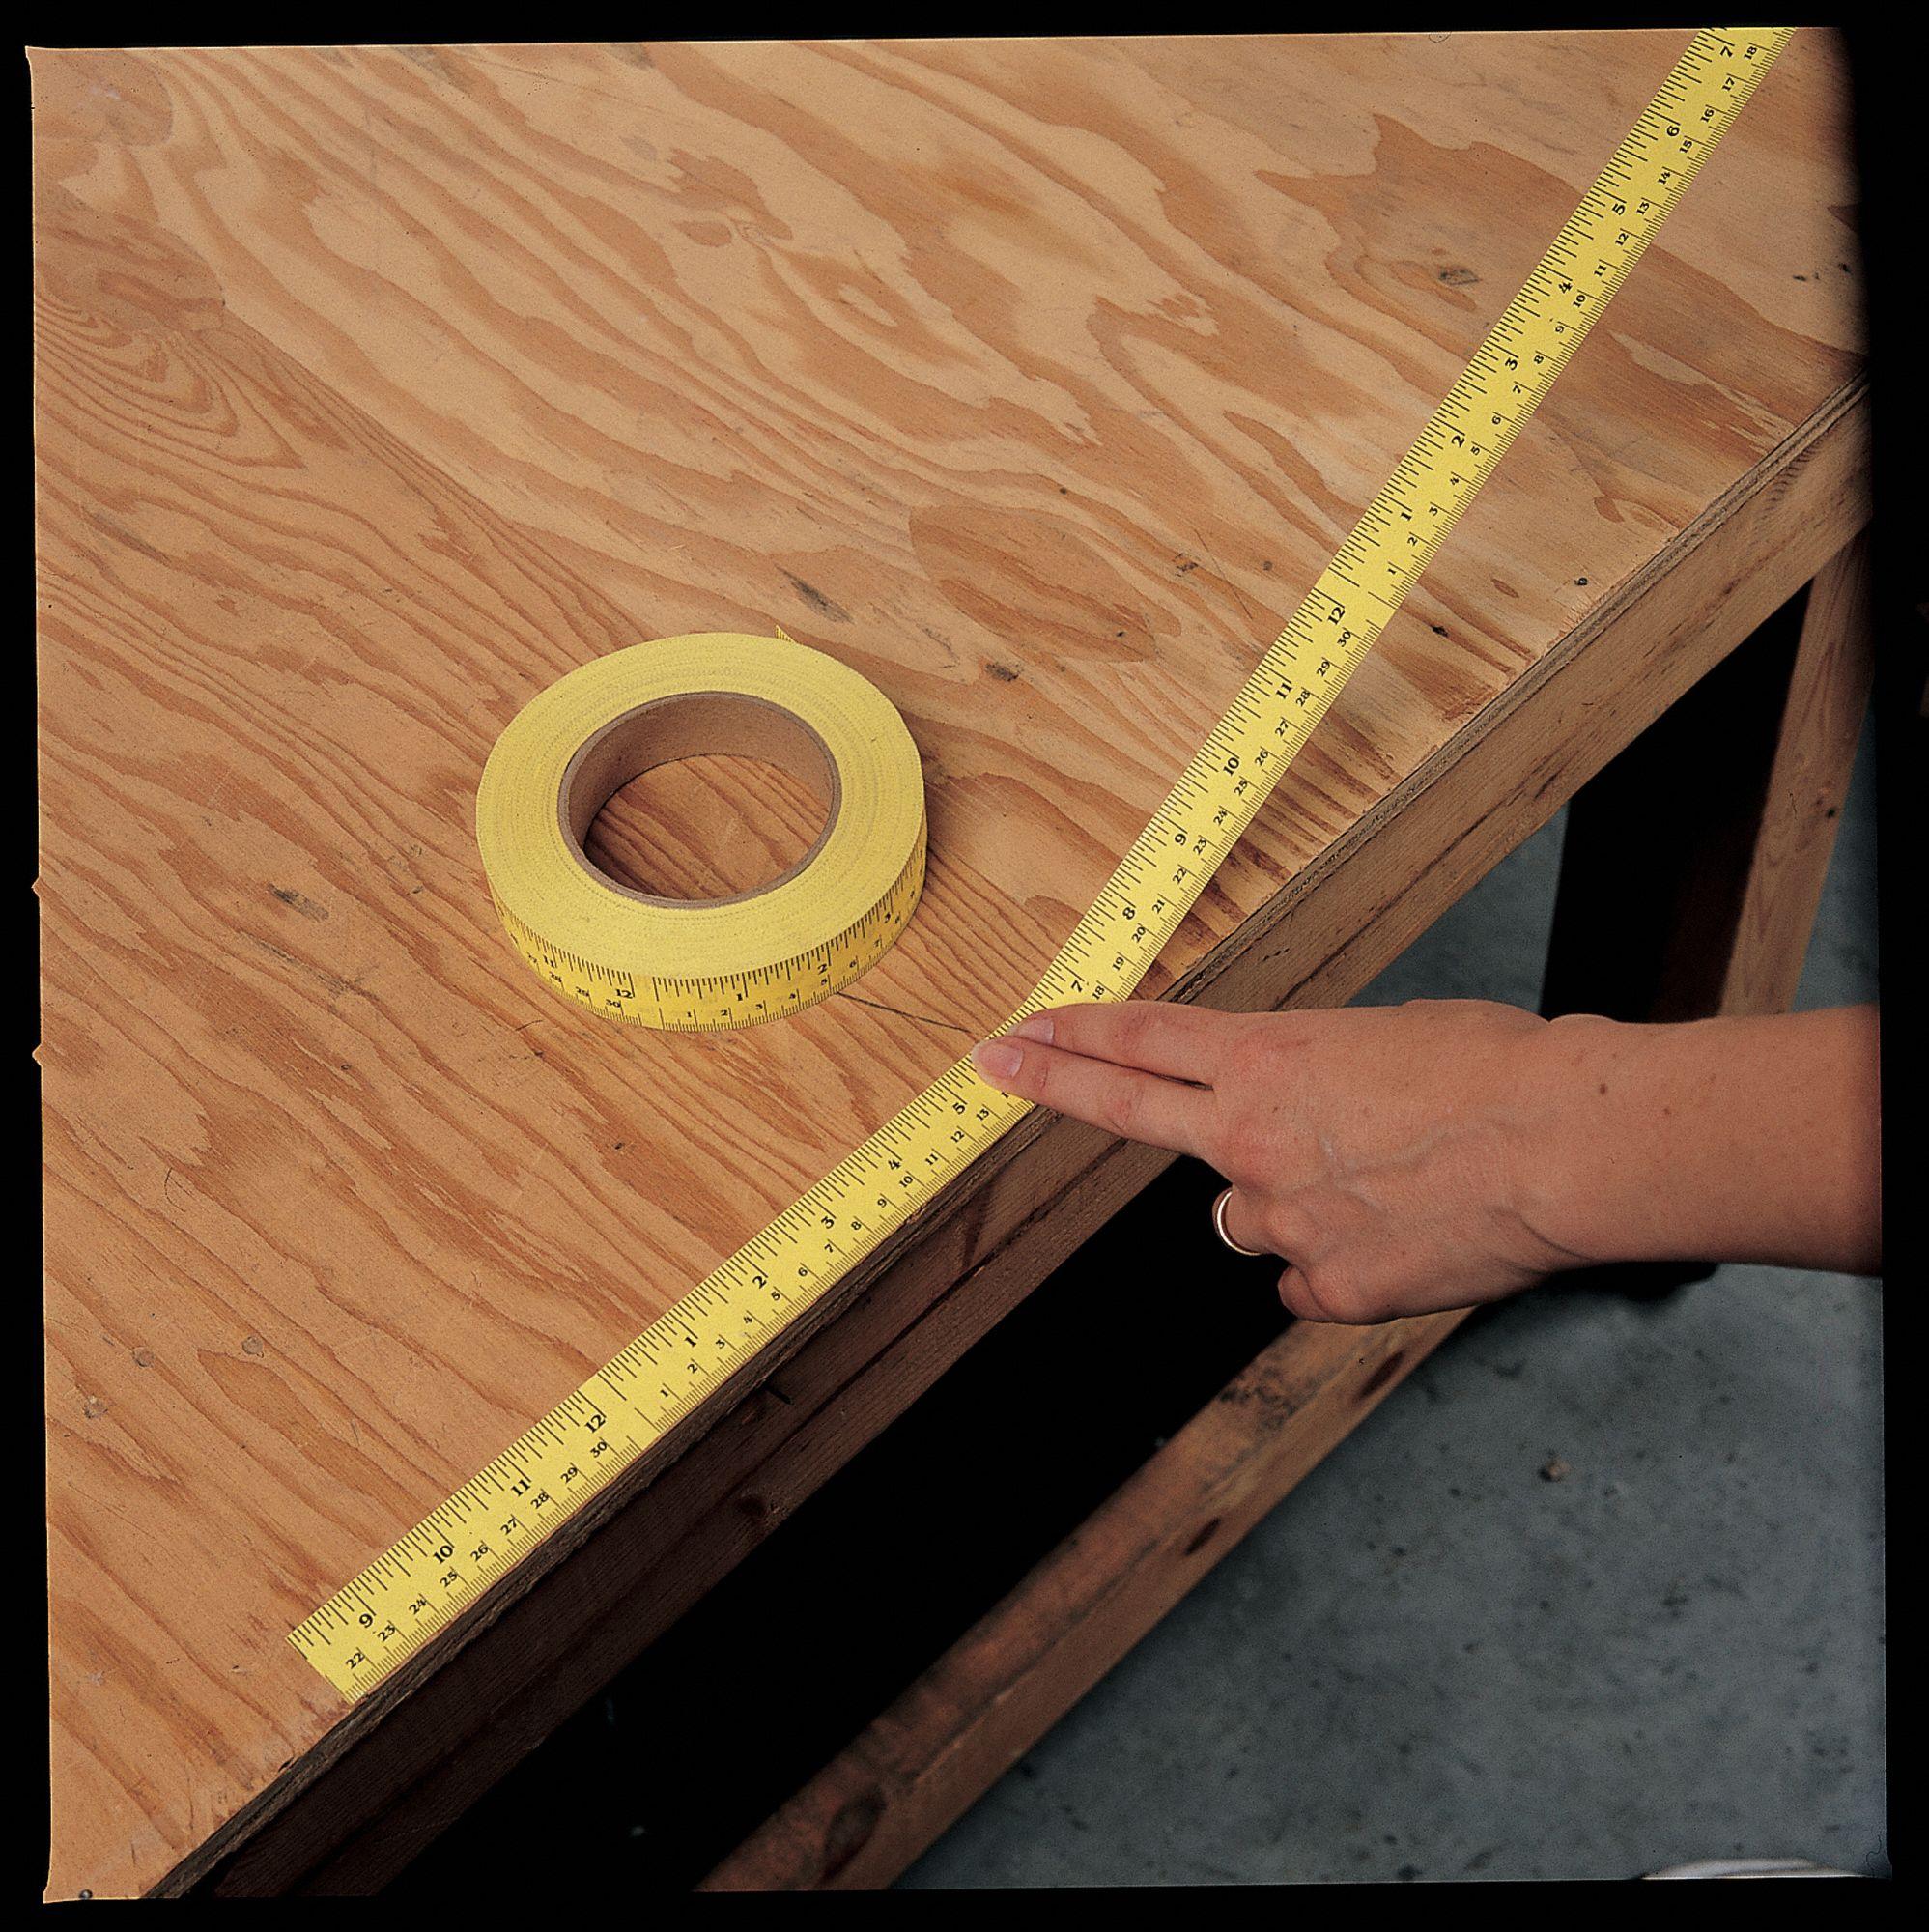 Adhesive Tape Measures